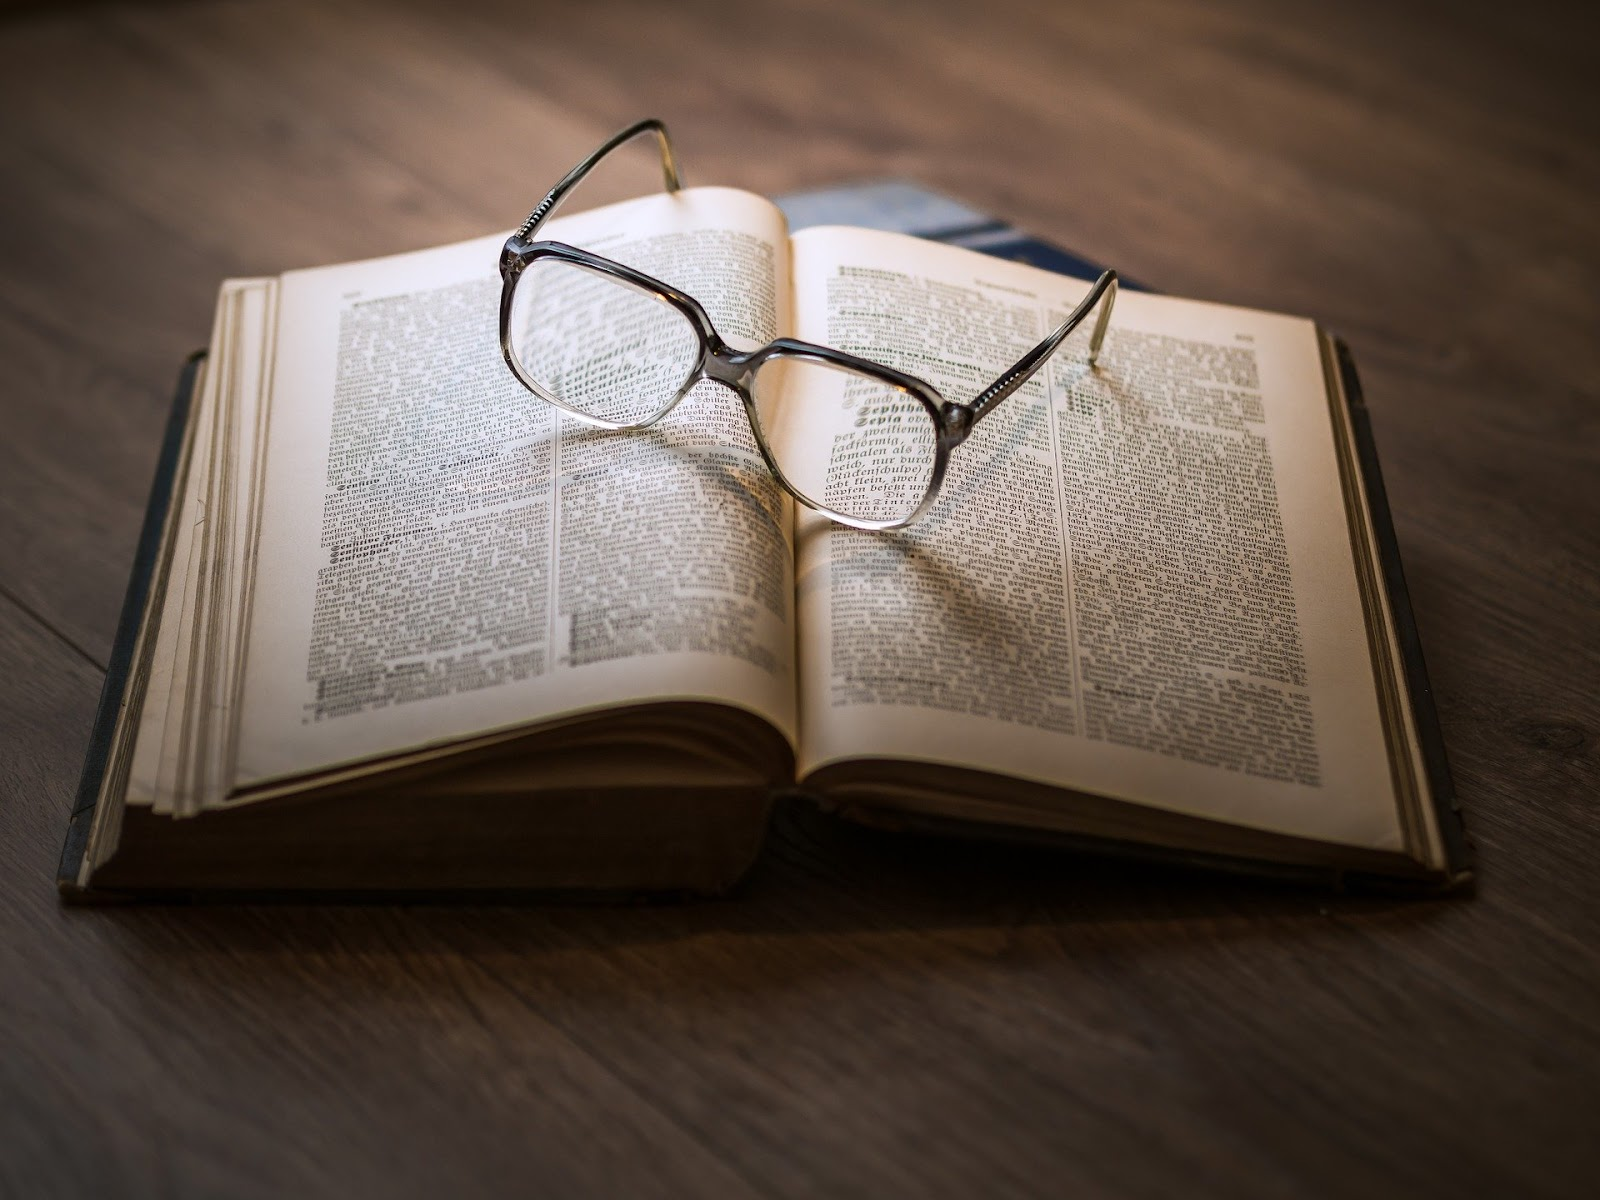 Book - credit DariuszSankowski on Pixabay